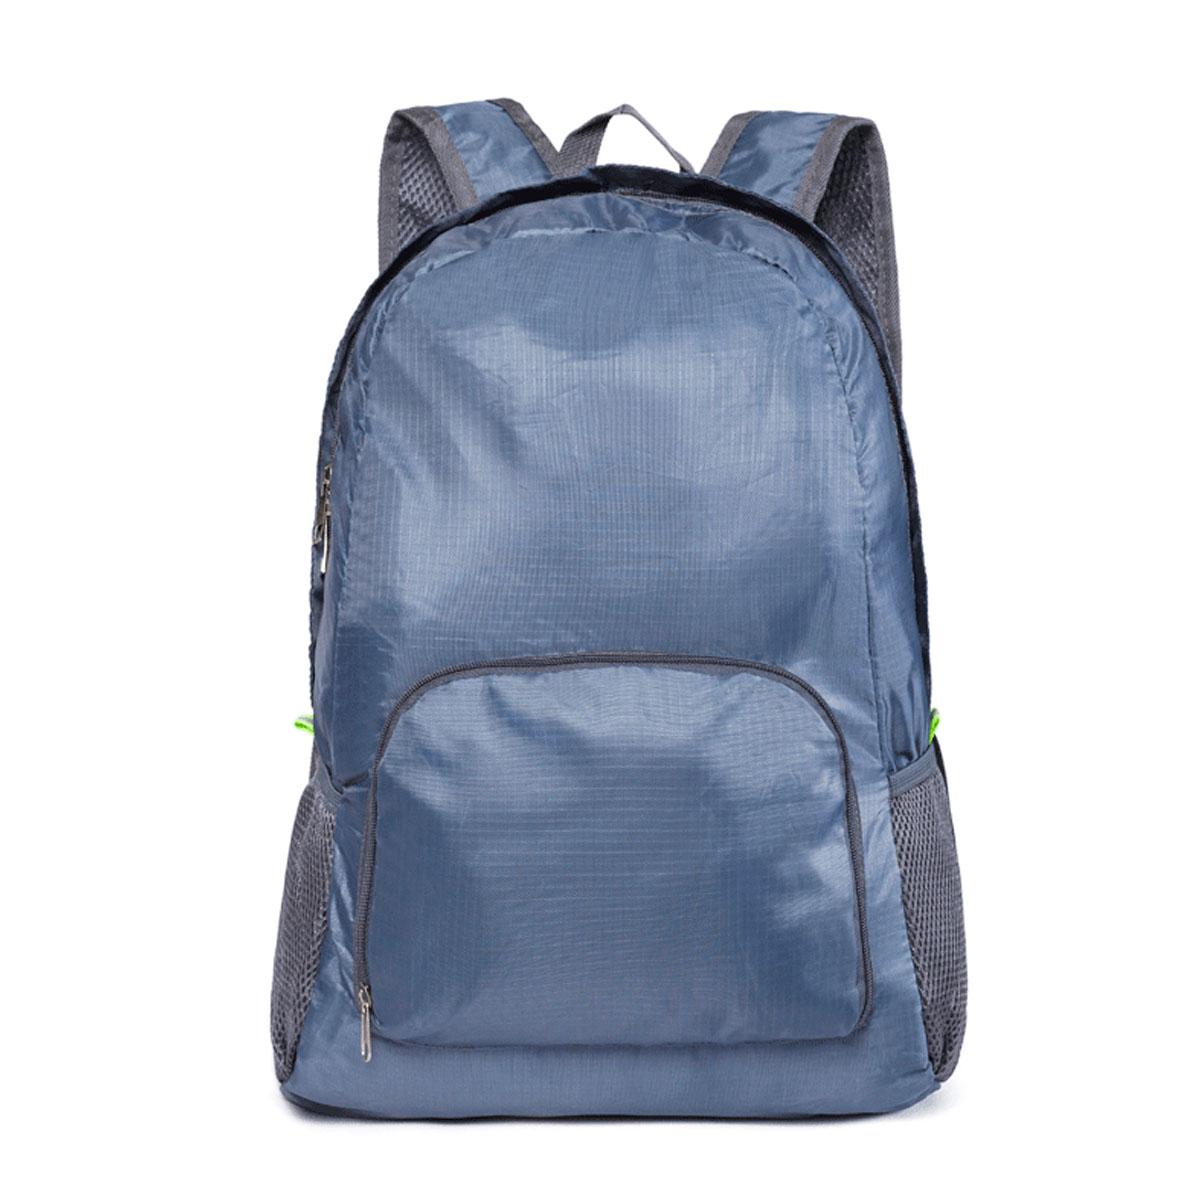 420D Polyester Waterproof Backpack Folding Sports Shoulder Bag Climbing Hiking Bag